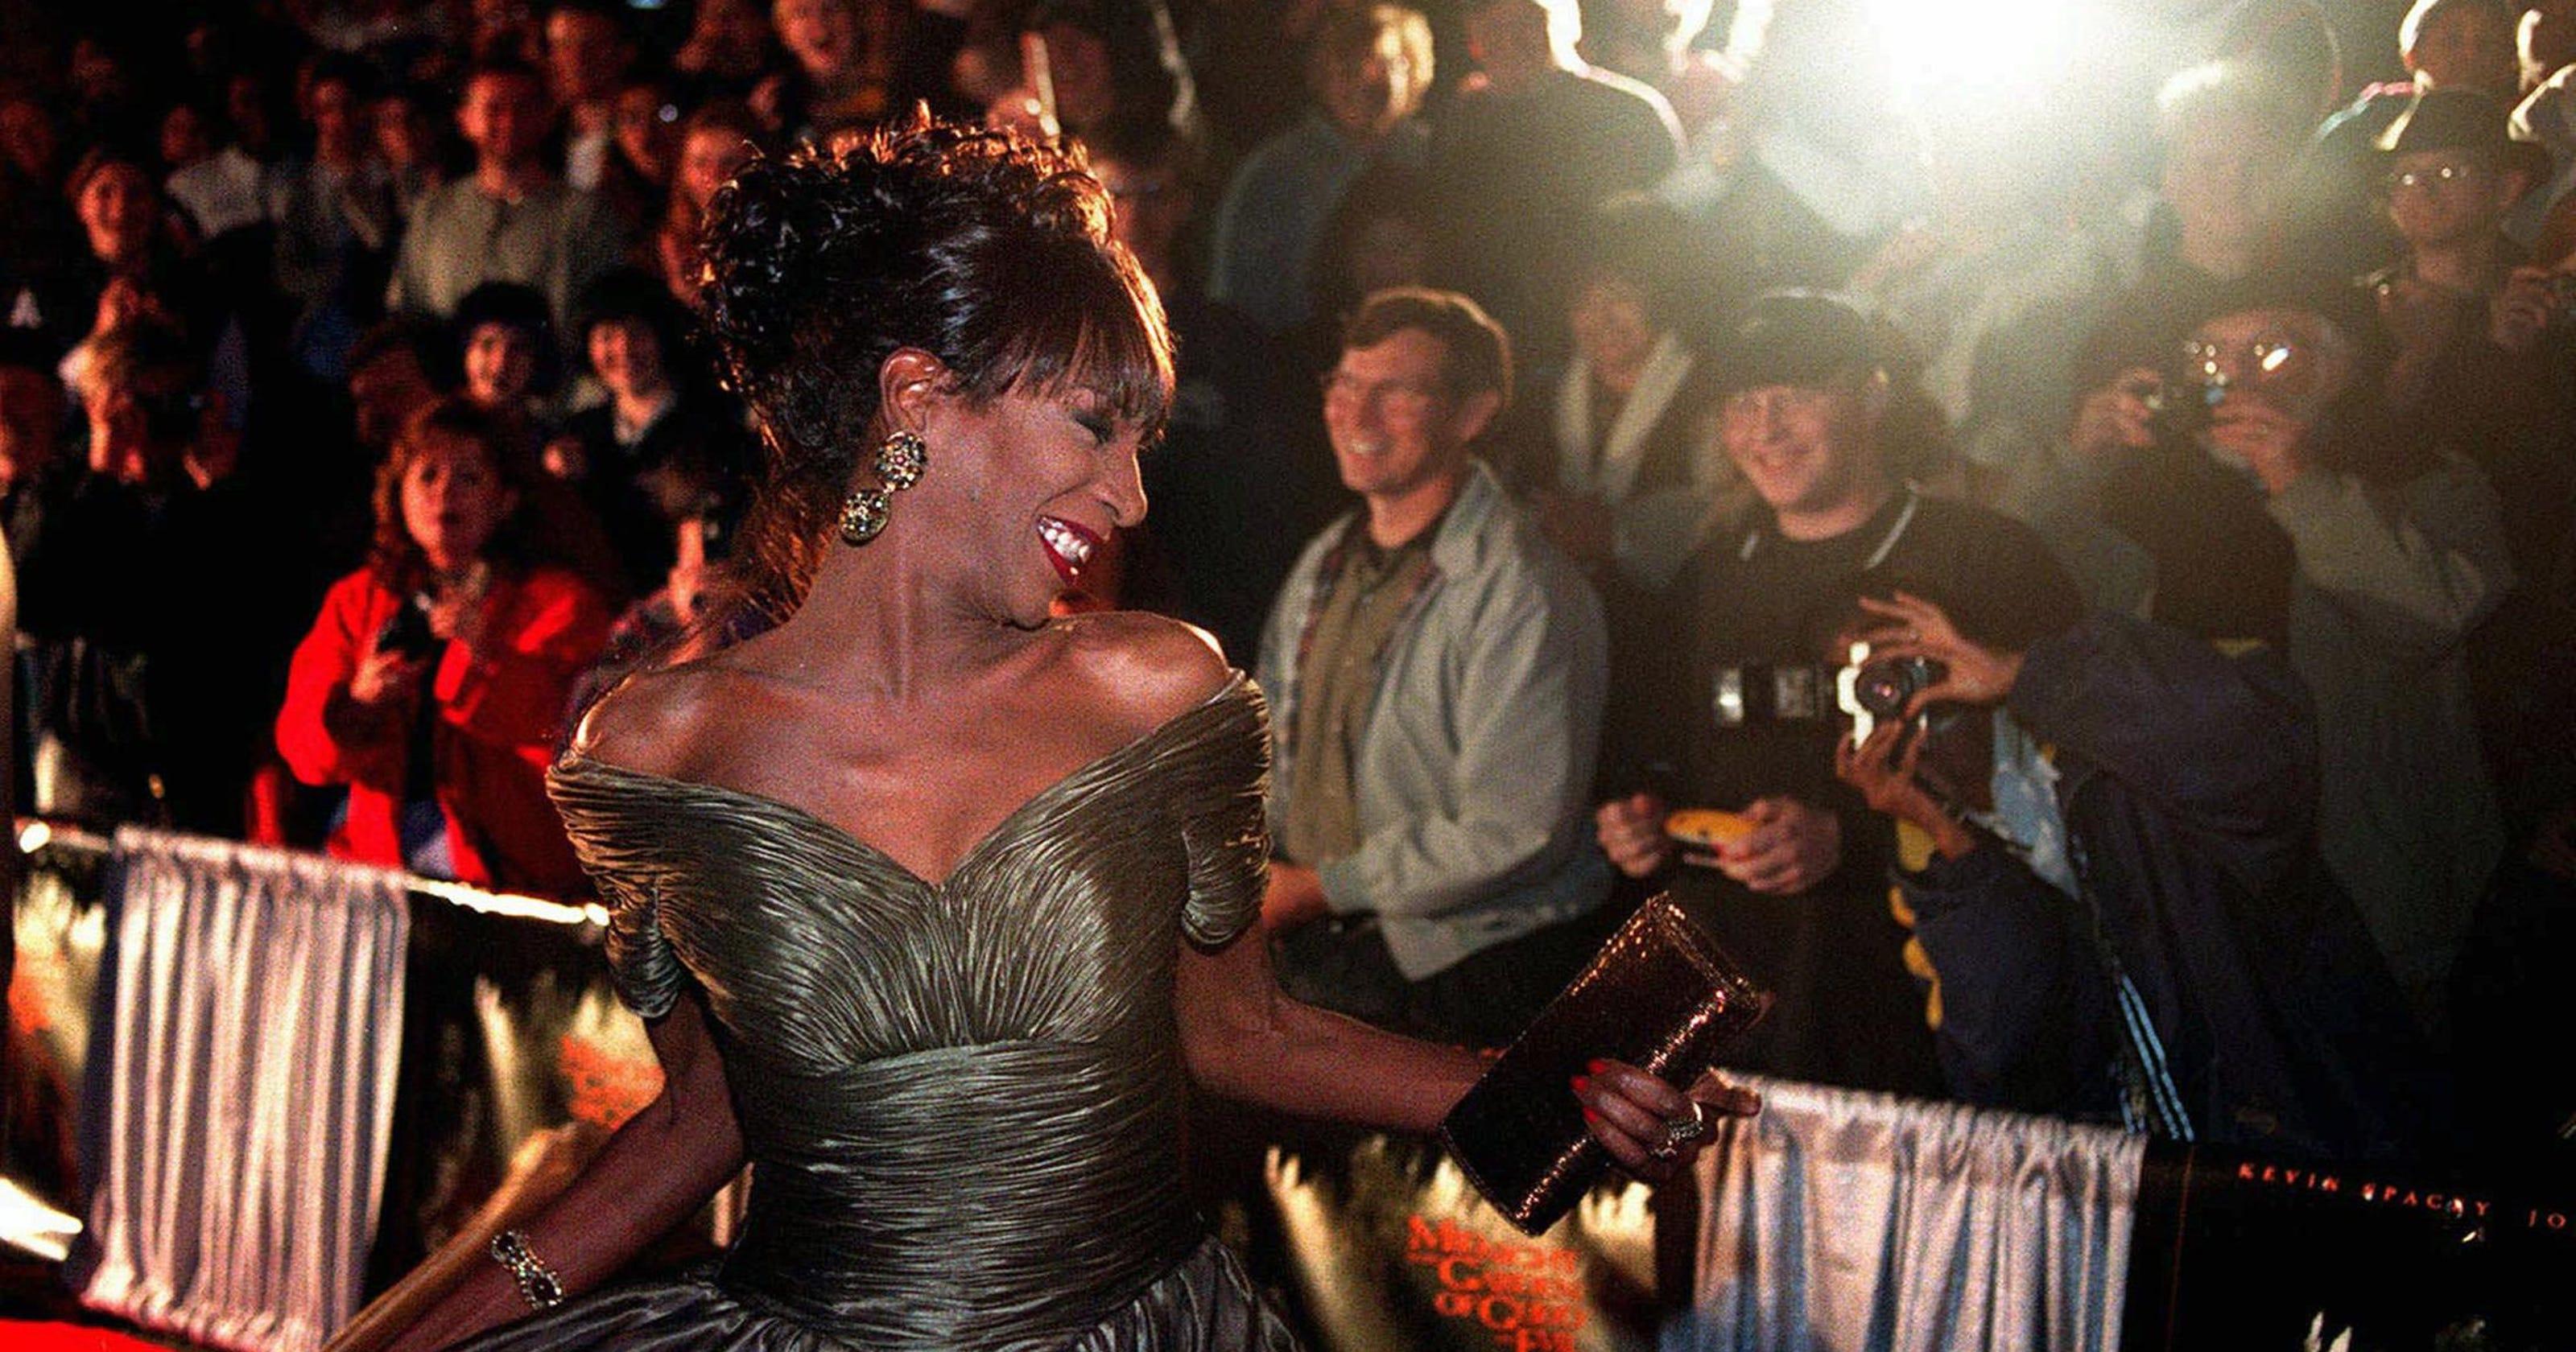 Lady Chablis, transgender \'Midnight\' star, has died